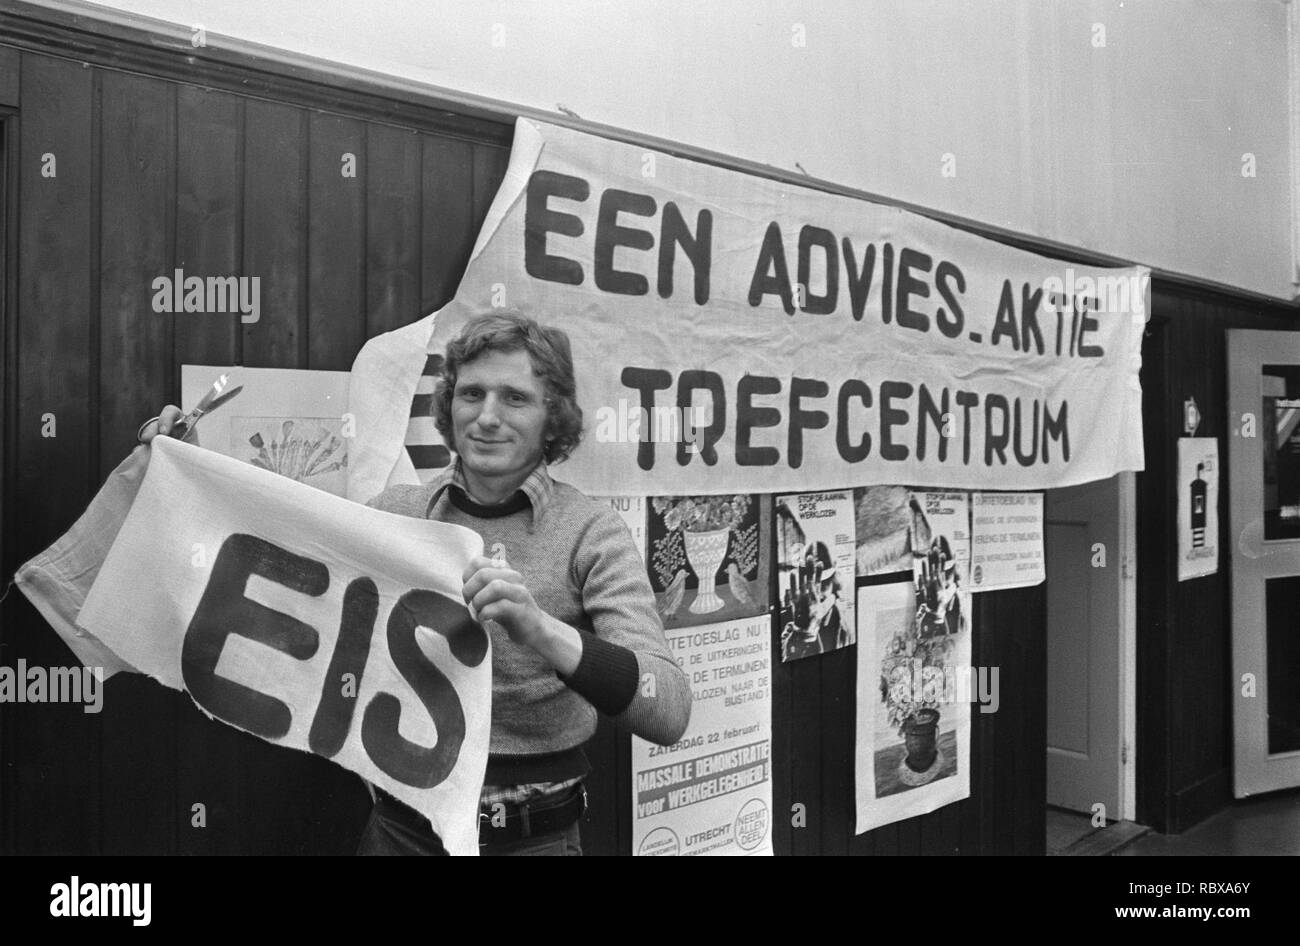 fb7041cbf61c Actiecentrum voor Amsterdams Werklozencomite voorzitter Jan Mannaerts met  spand